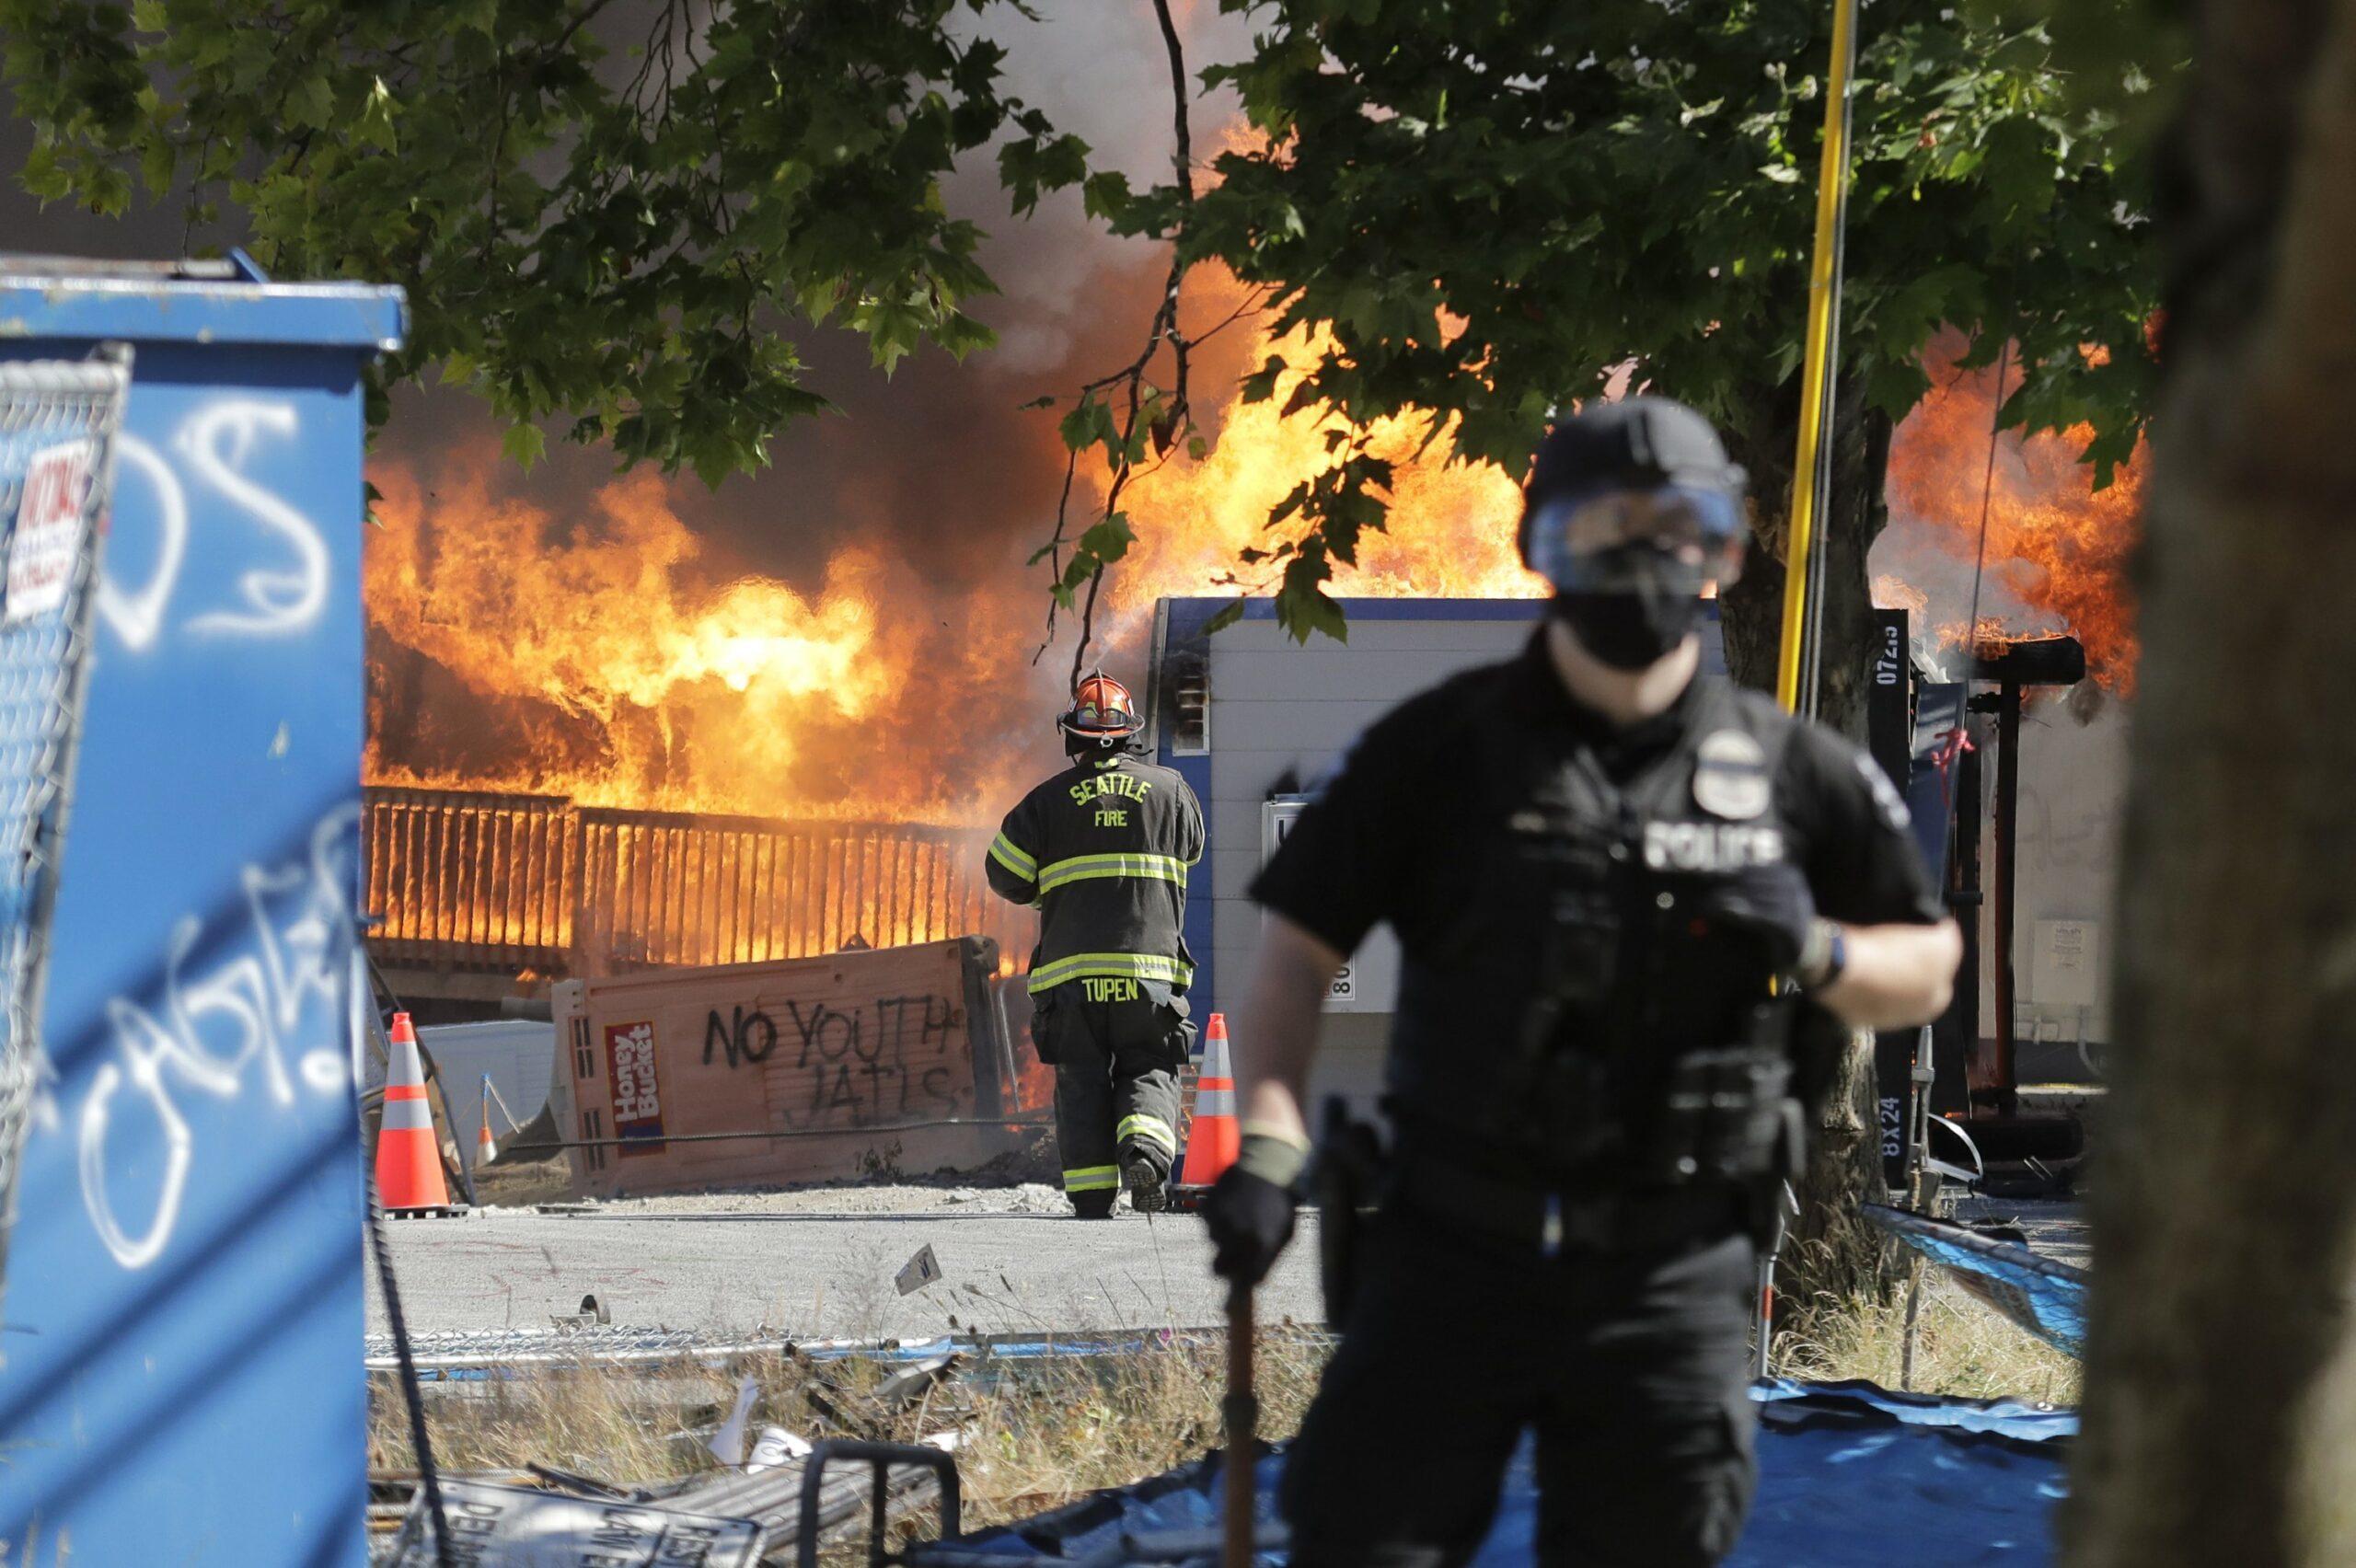 Police declare riot at Seattle protests, make arrests 2